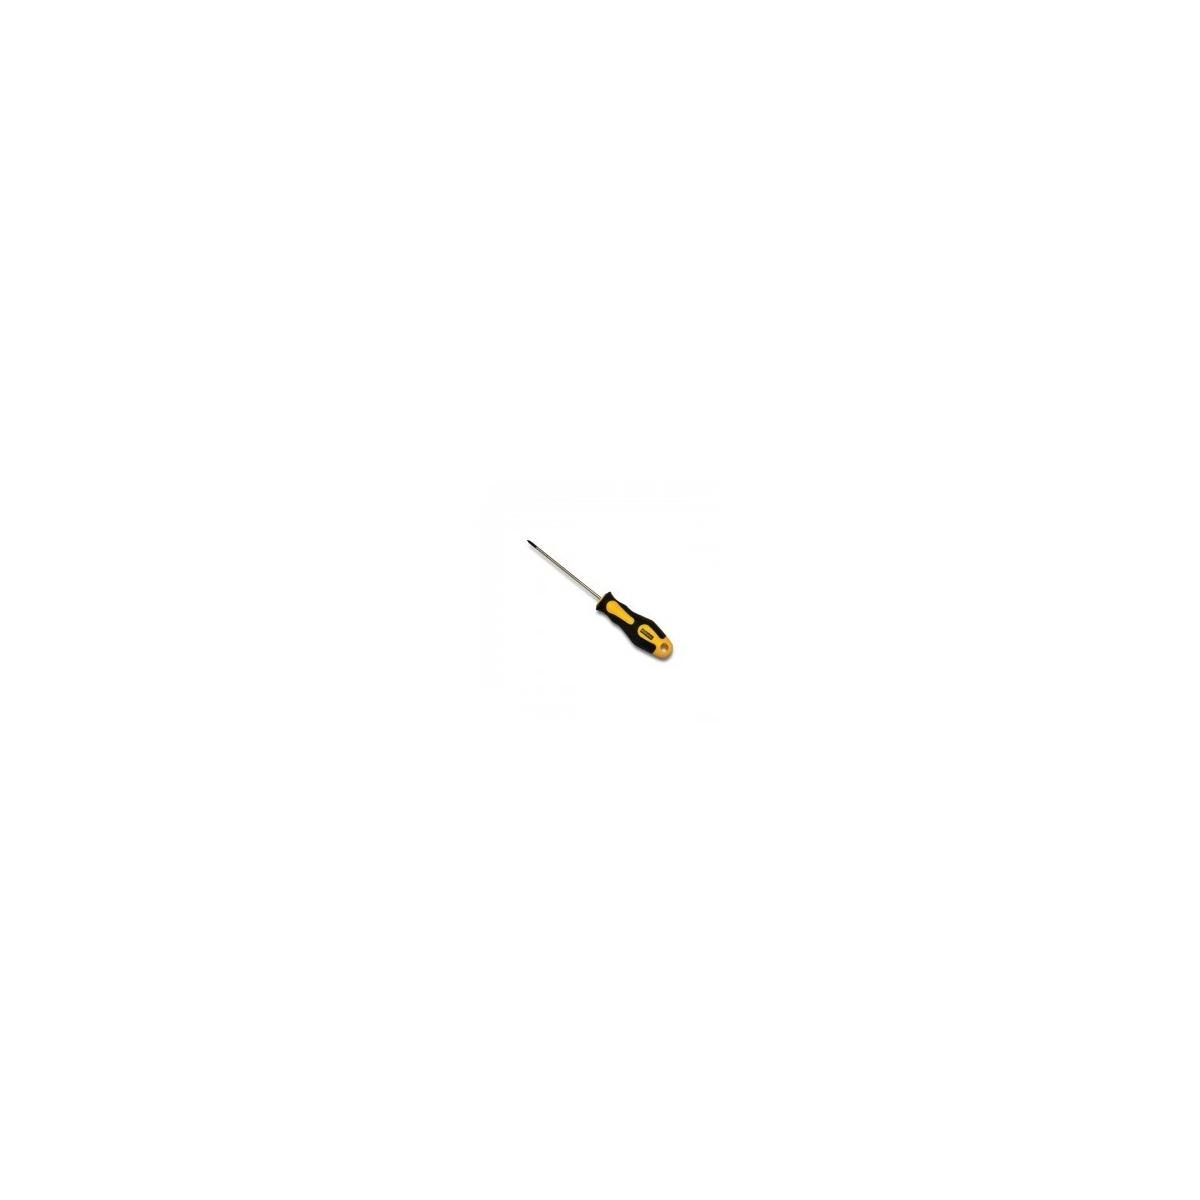 Wkrętak PZ0 x 75 mm COVAL - PPPZ-0/75 Wkrętak PZ0 x 75 mm COVAL - PPPZ-0/75